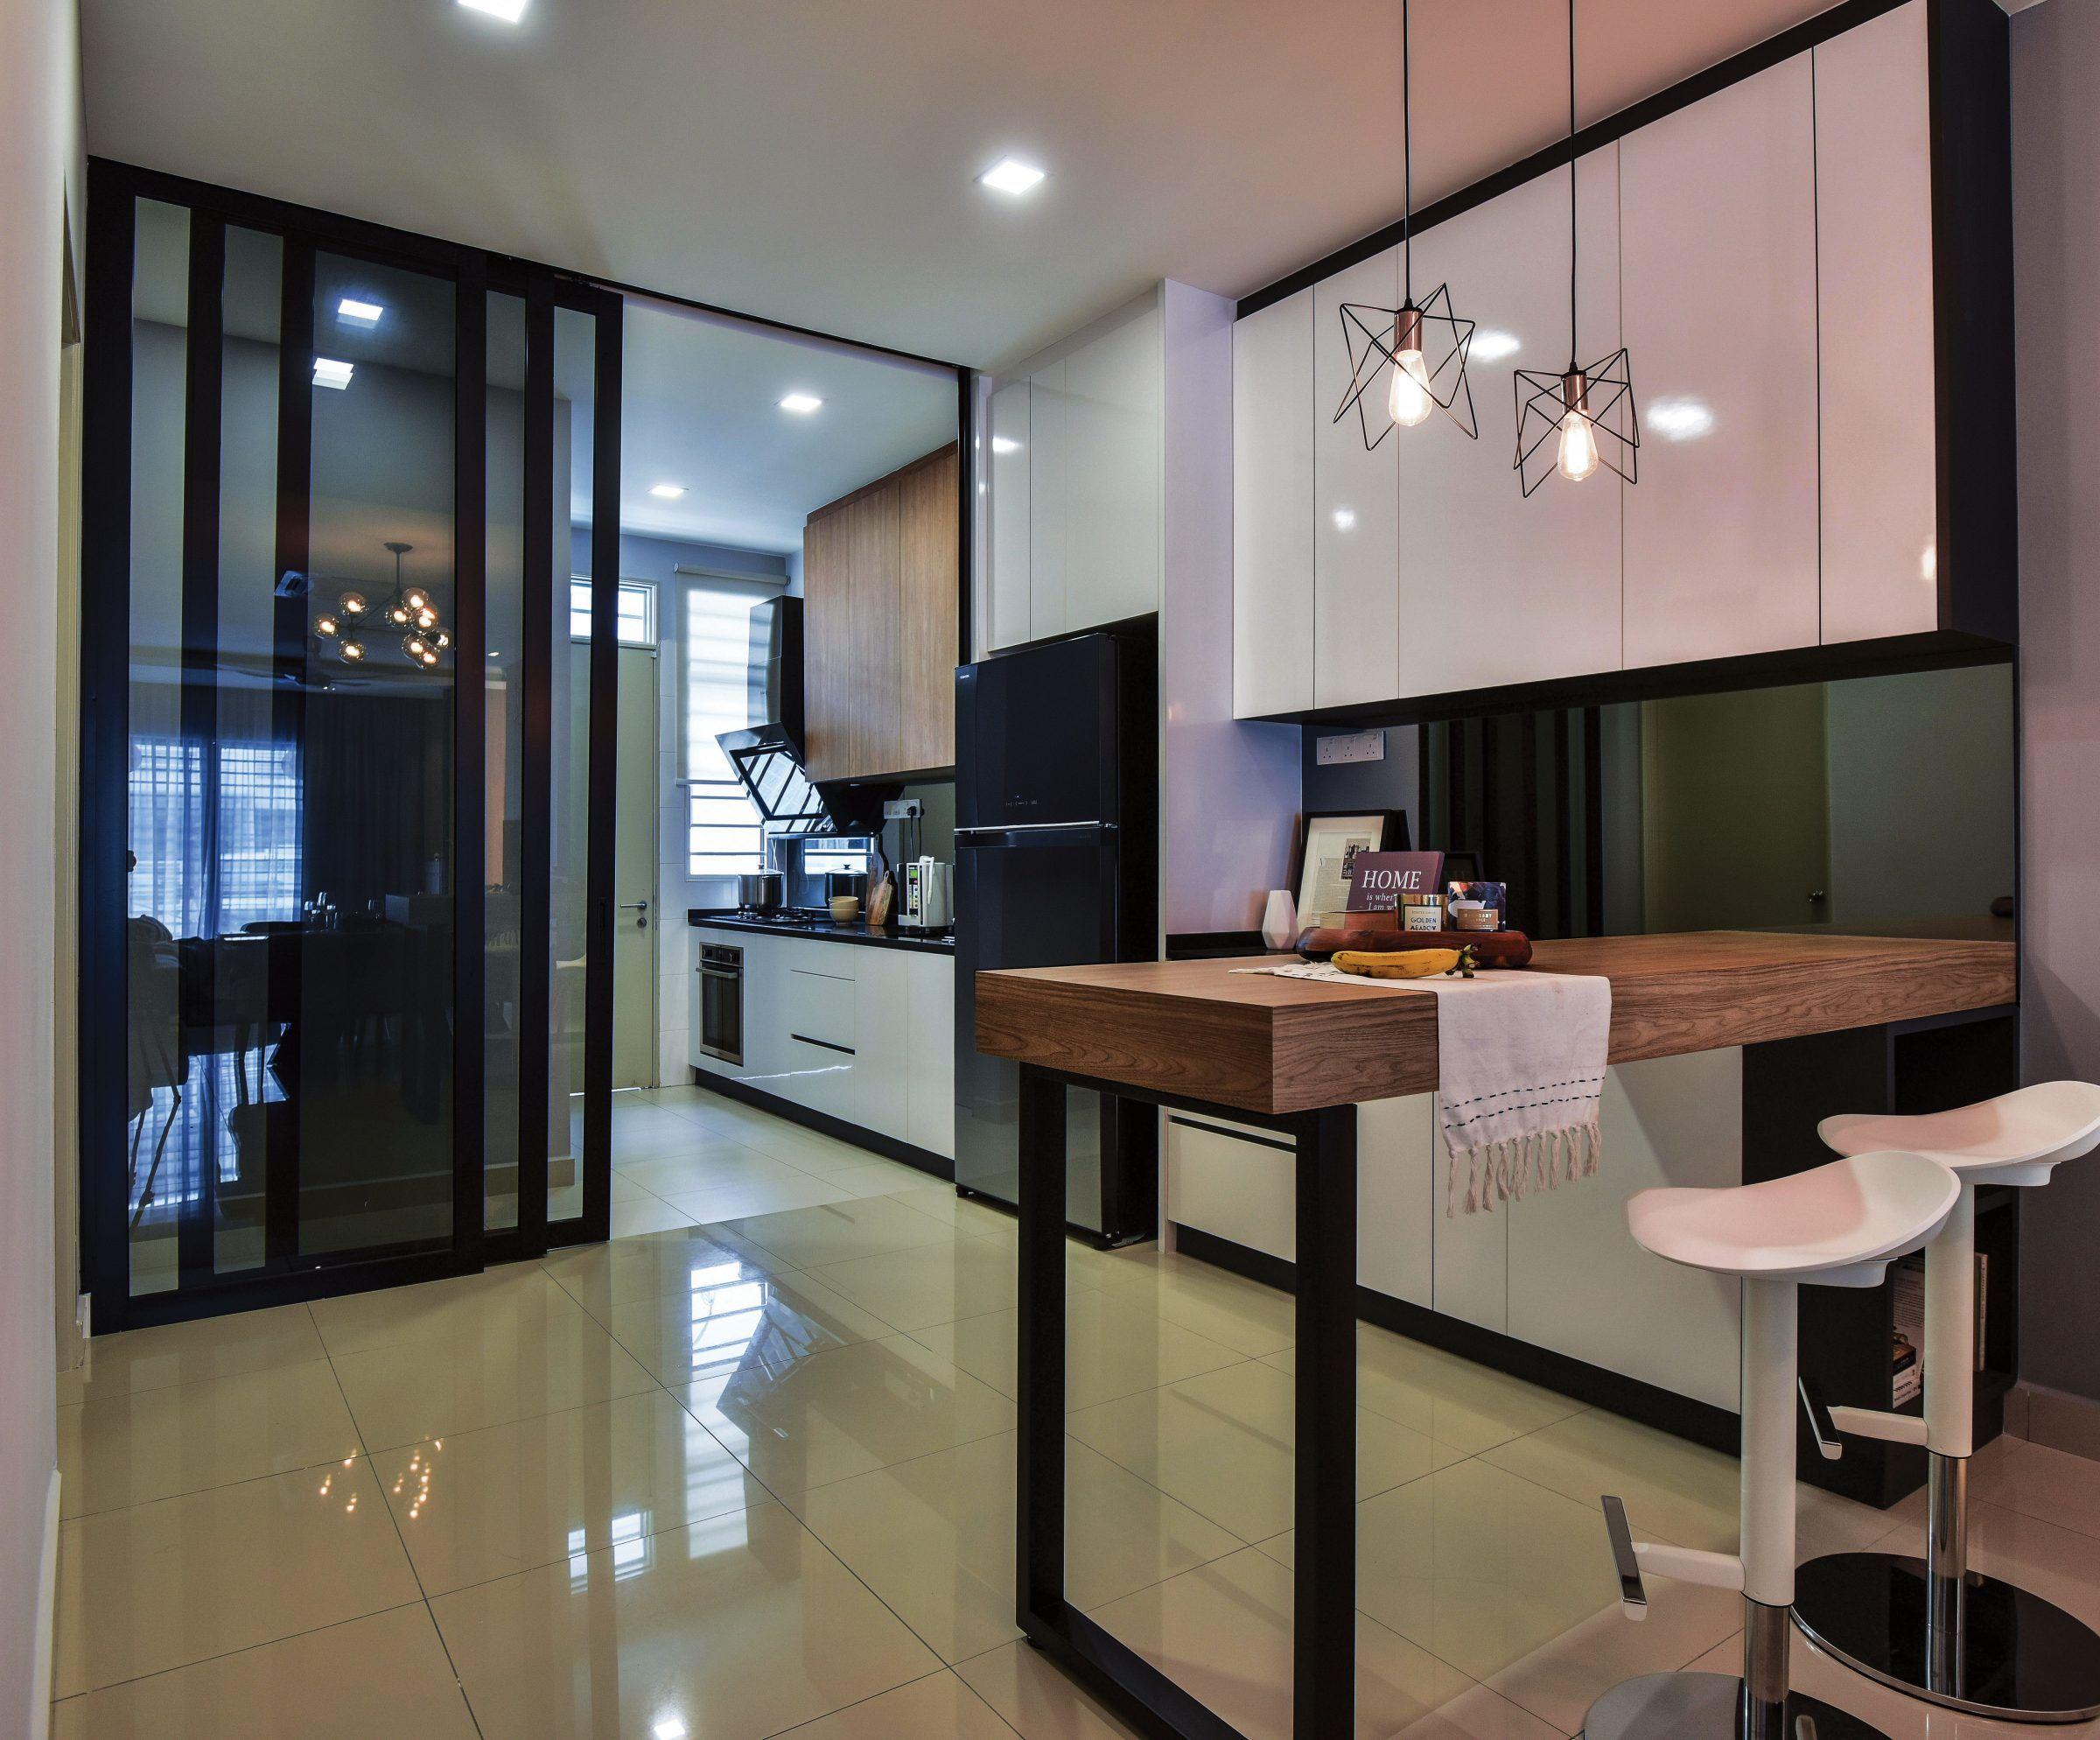 Equilateral Design The Roof Studio Malaysia S No 1 Interior Design Channel In 2020 Interior Kitchen Design Interior Design